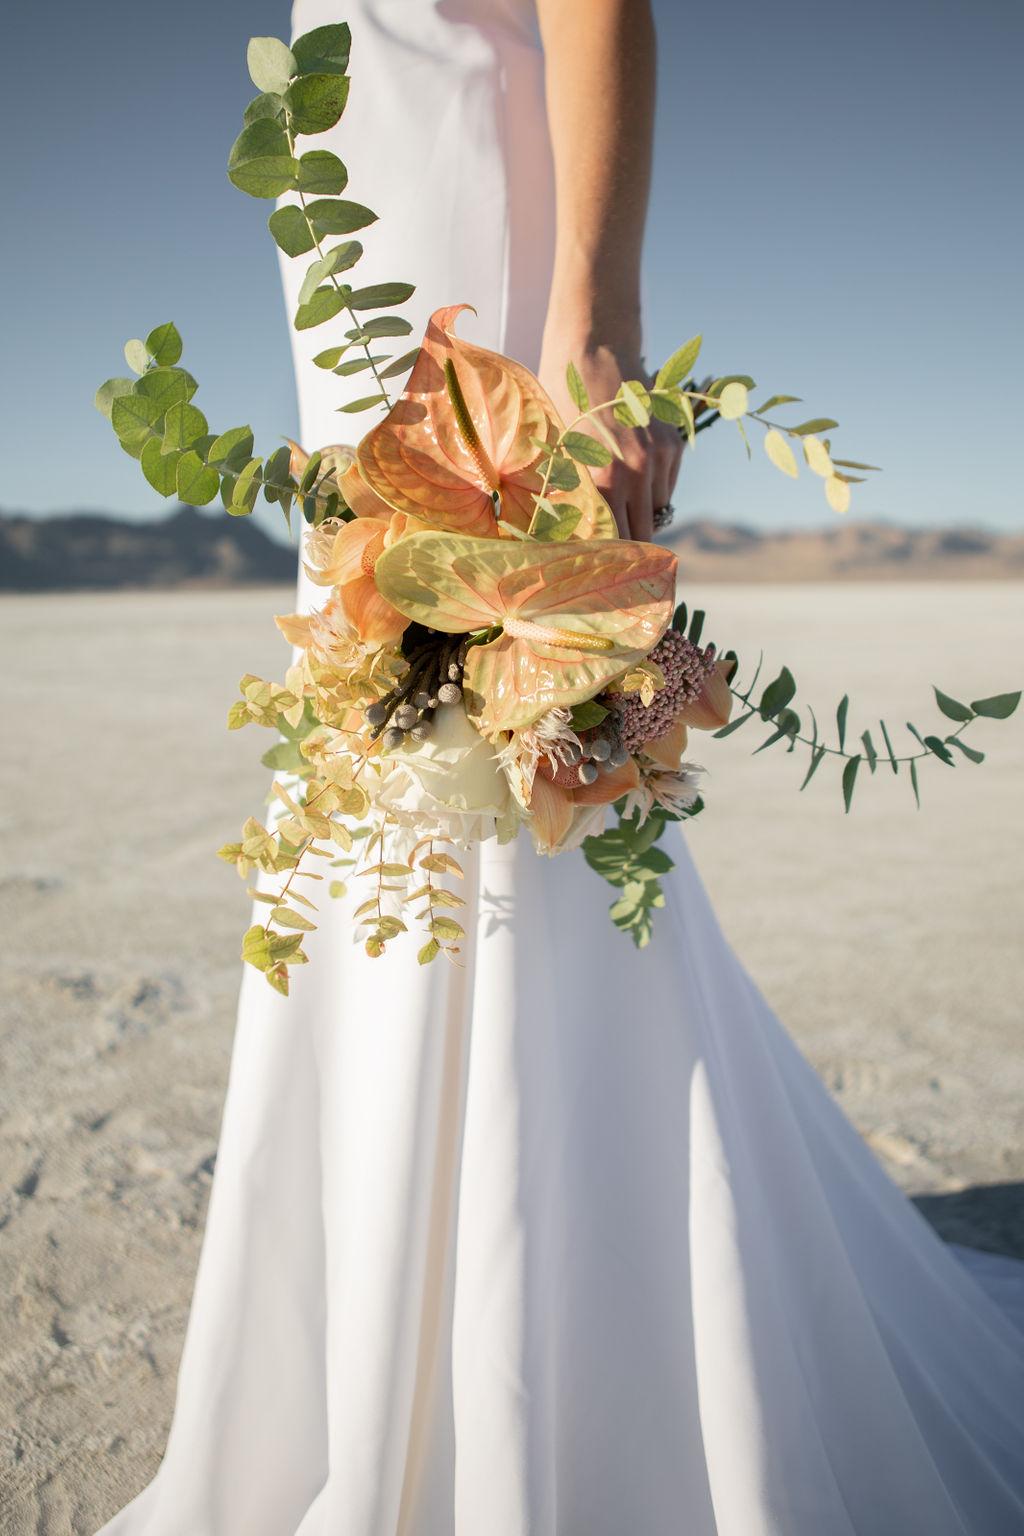 Simple Elegant Modern Wild Pastel Wedding Bouquet Victoria Chukarov Salt Flats Utah